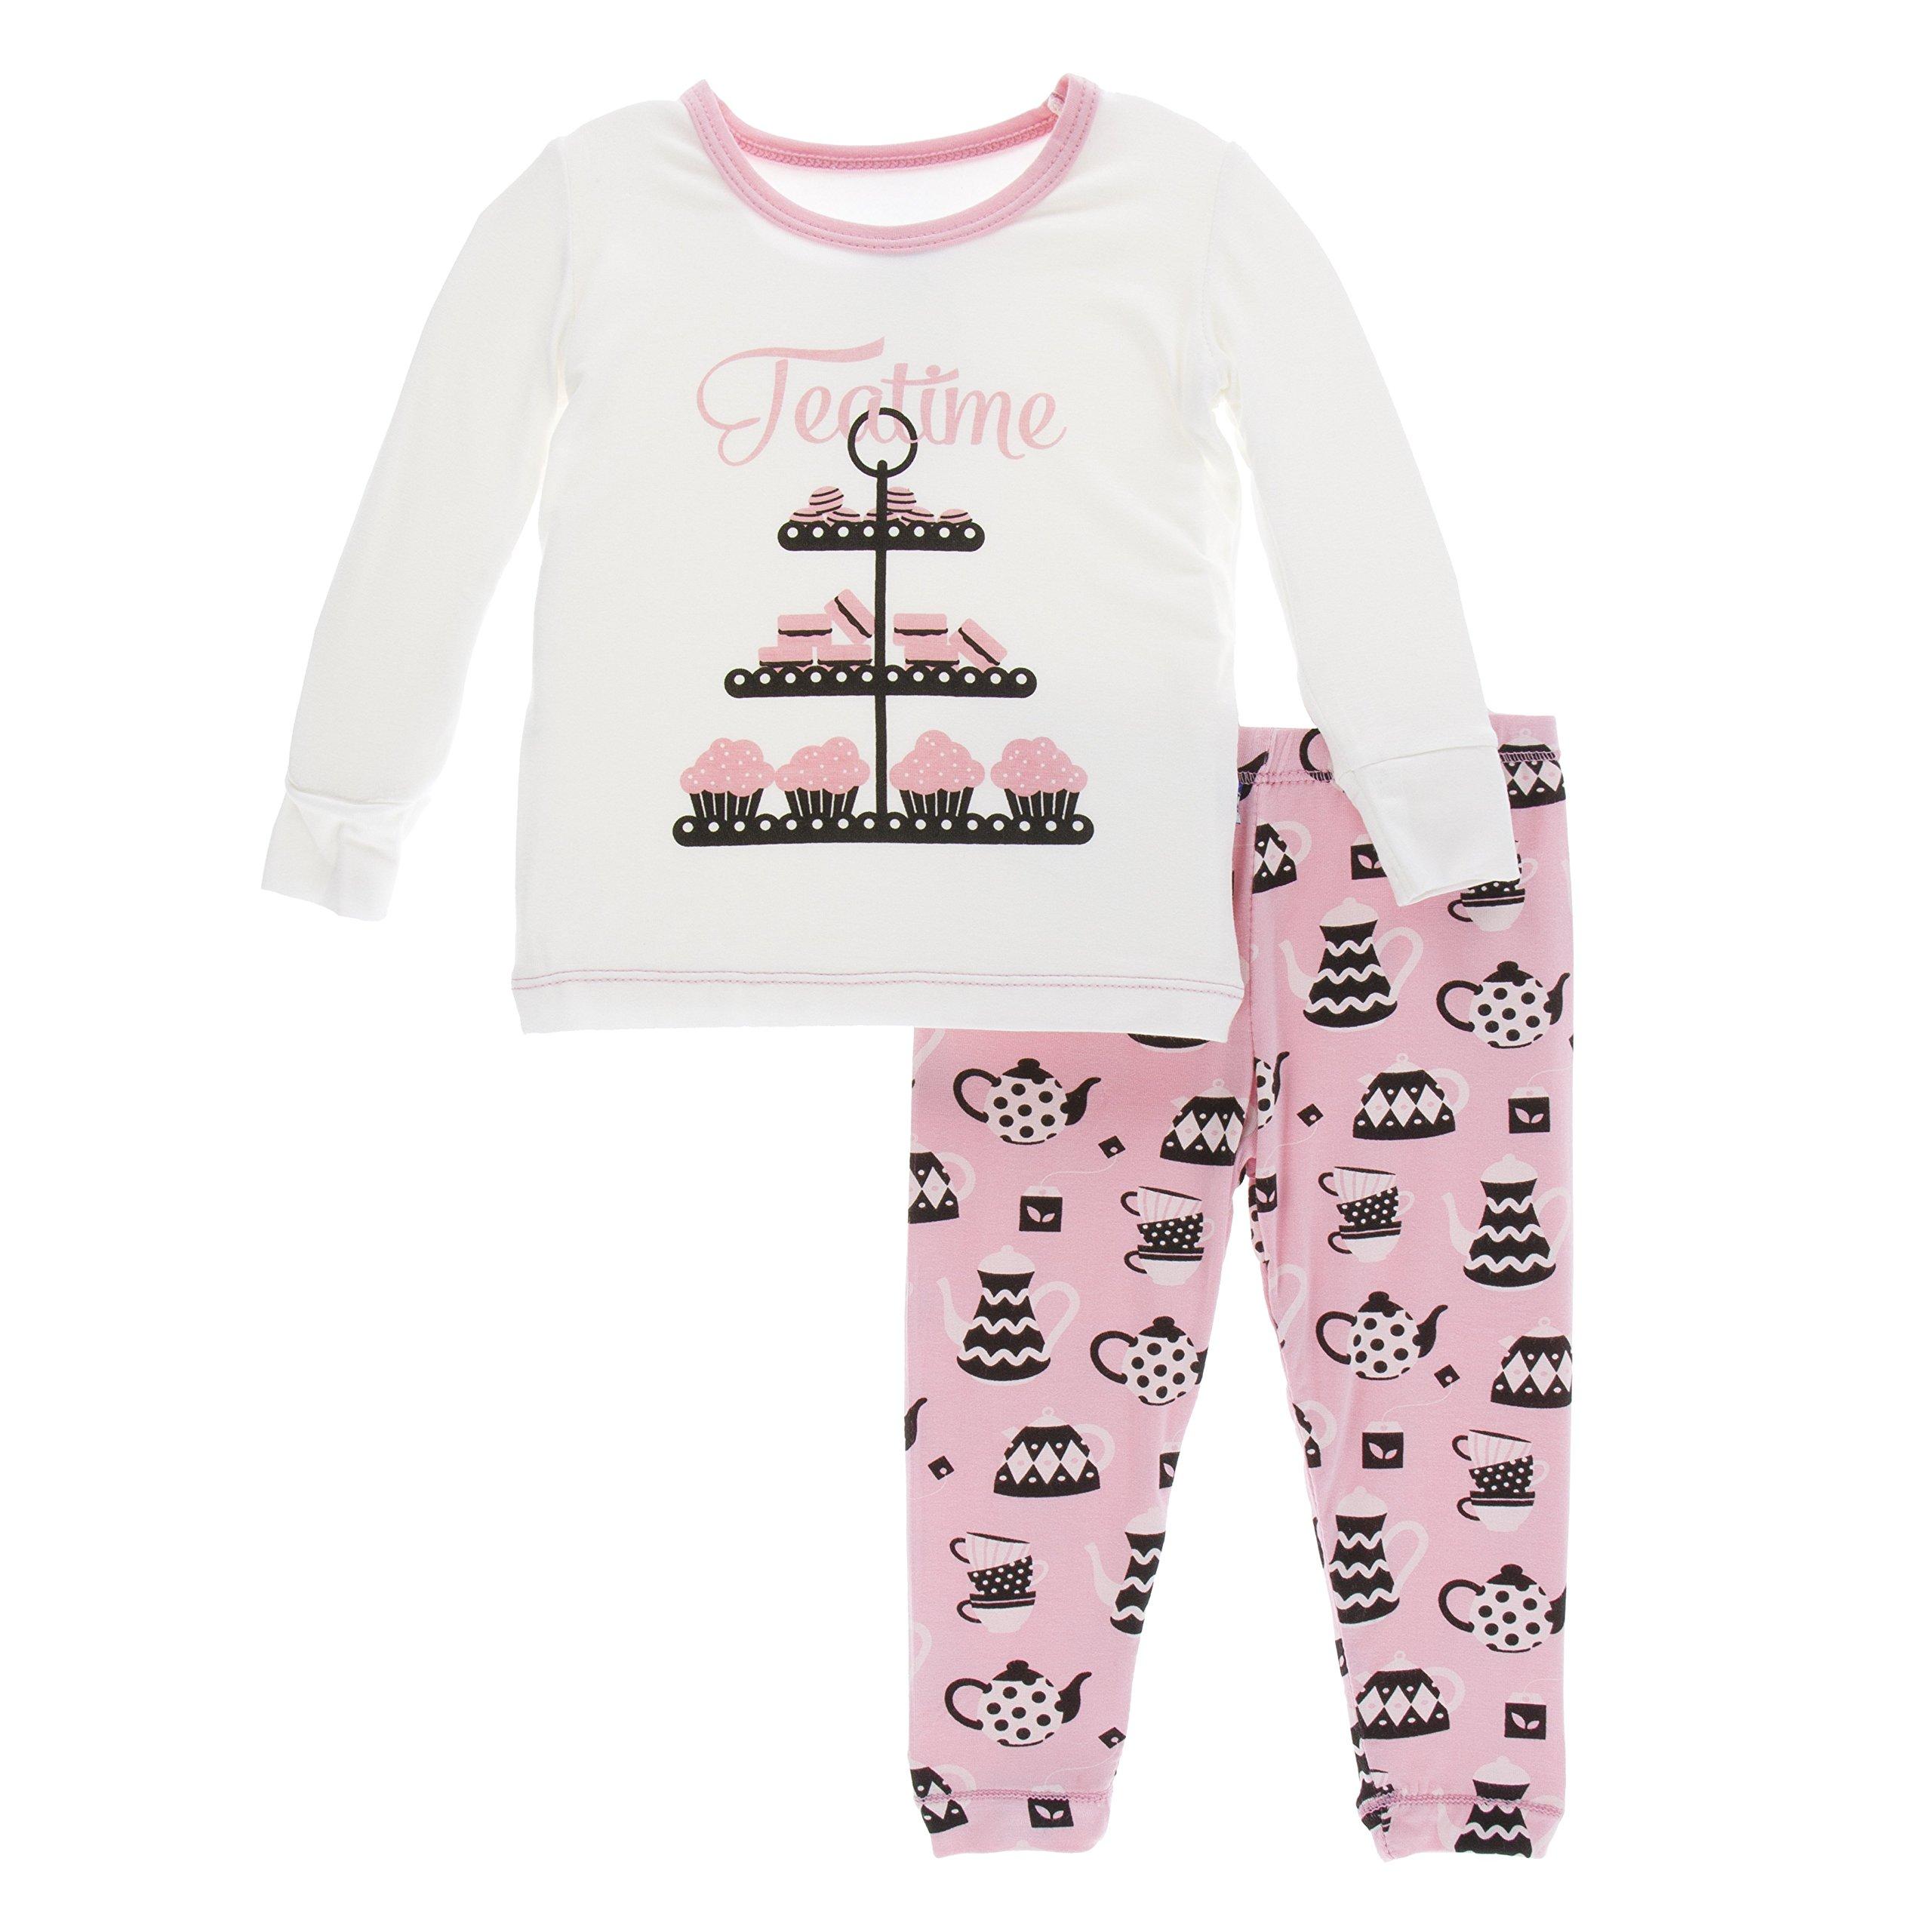 Kickee Pants Little Boys Print Long Sleeve Pajama Set, Teatime, Boys 5 Years